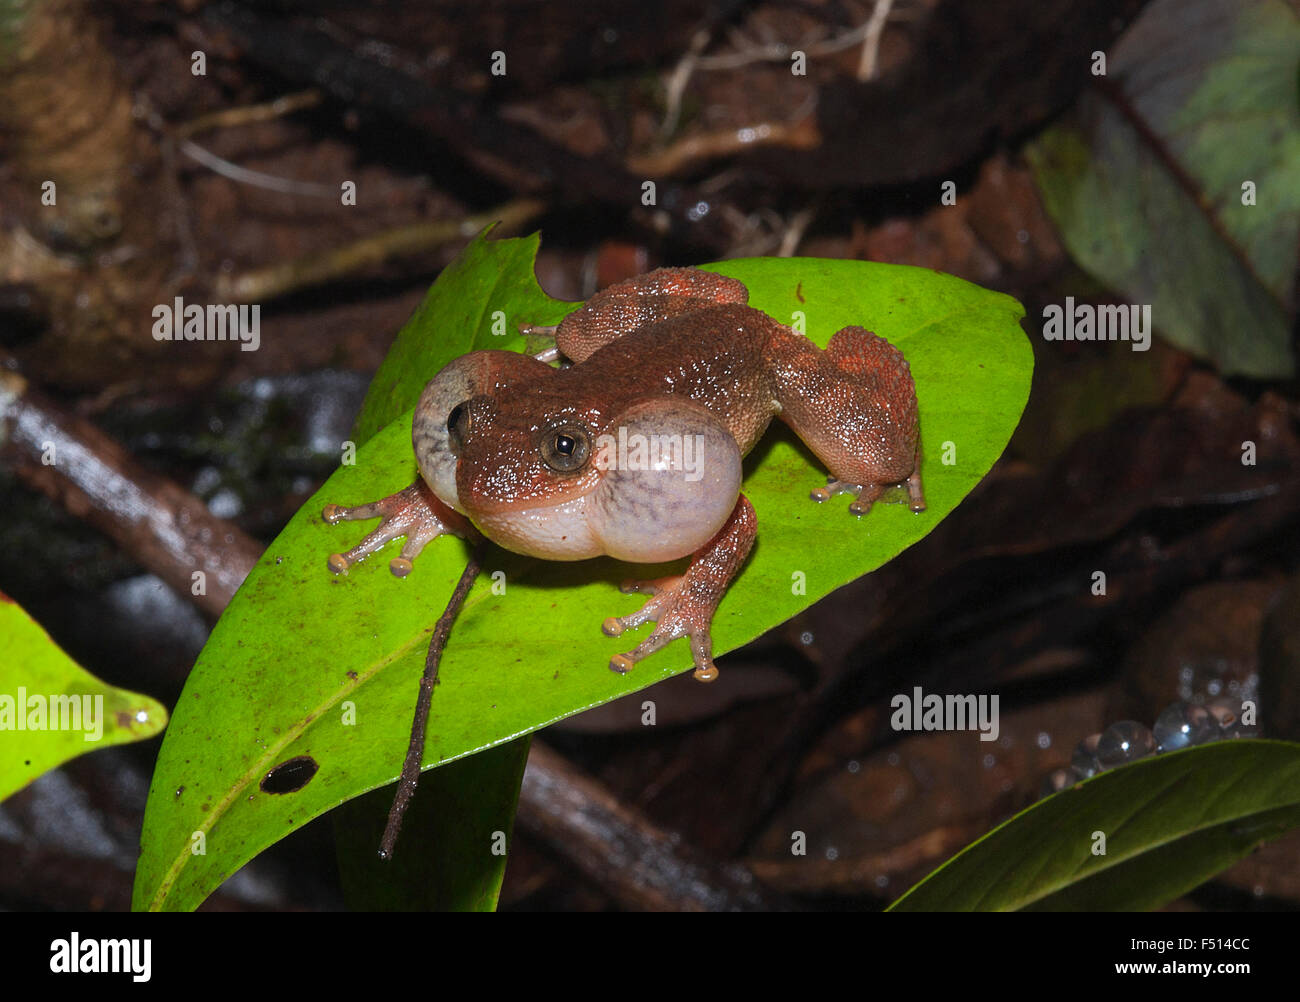 Das Bild der runzlig Frosch (Nyctibatrachus Petraeus) aufgenommen in Amboli Ghta, Maharashtra, Indien Stockbild